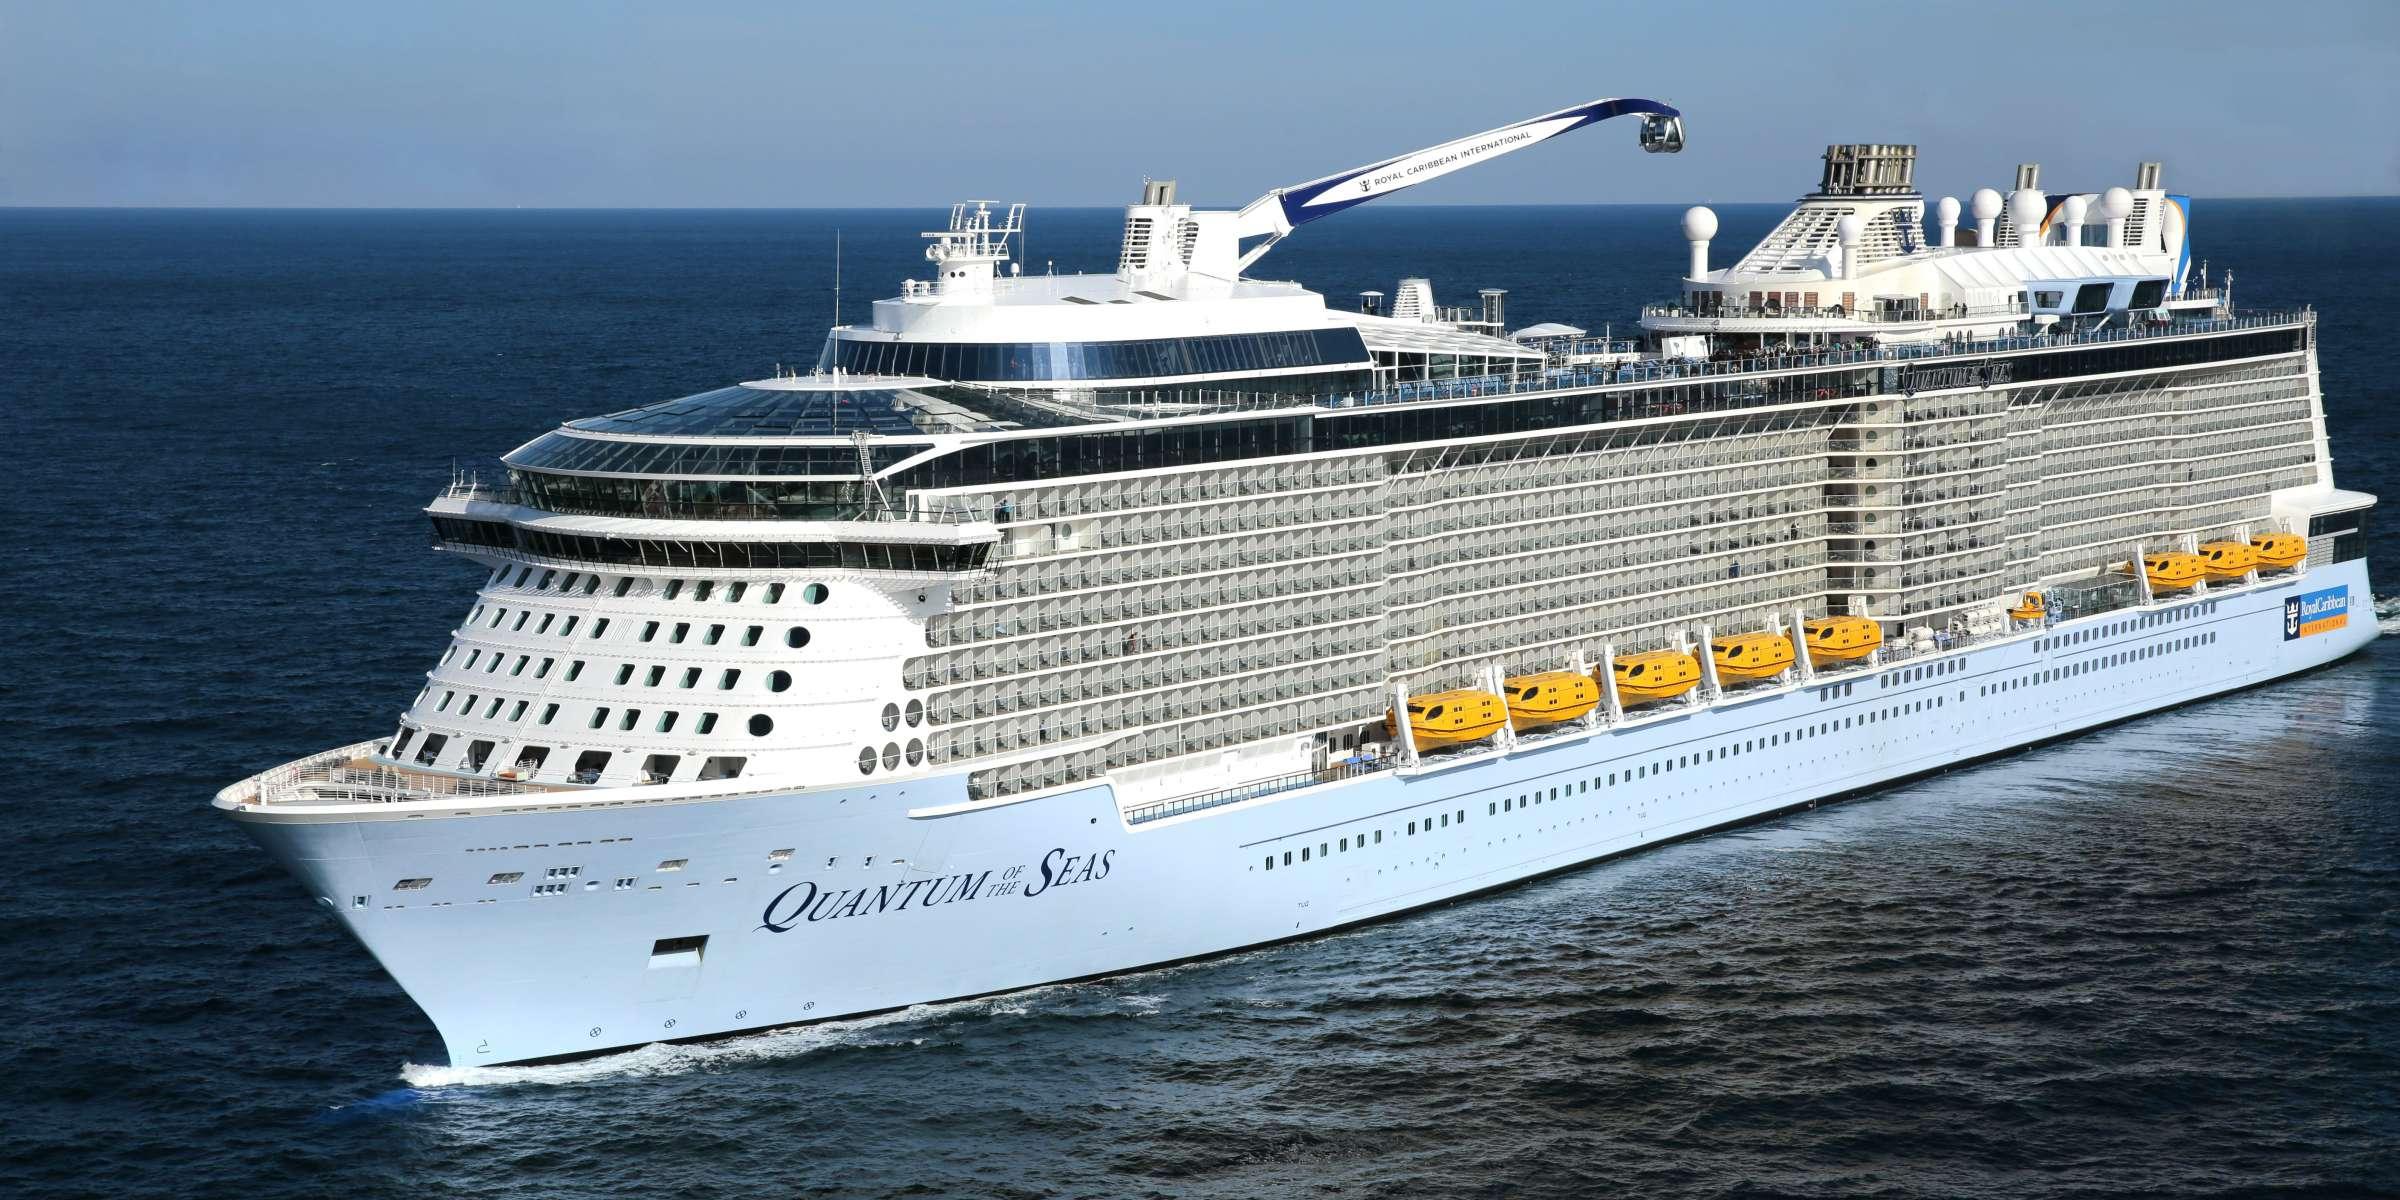 Royal Caribbean Cruises | Cruise Deals on Quantum of the Seas